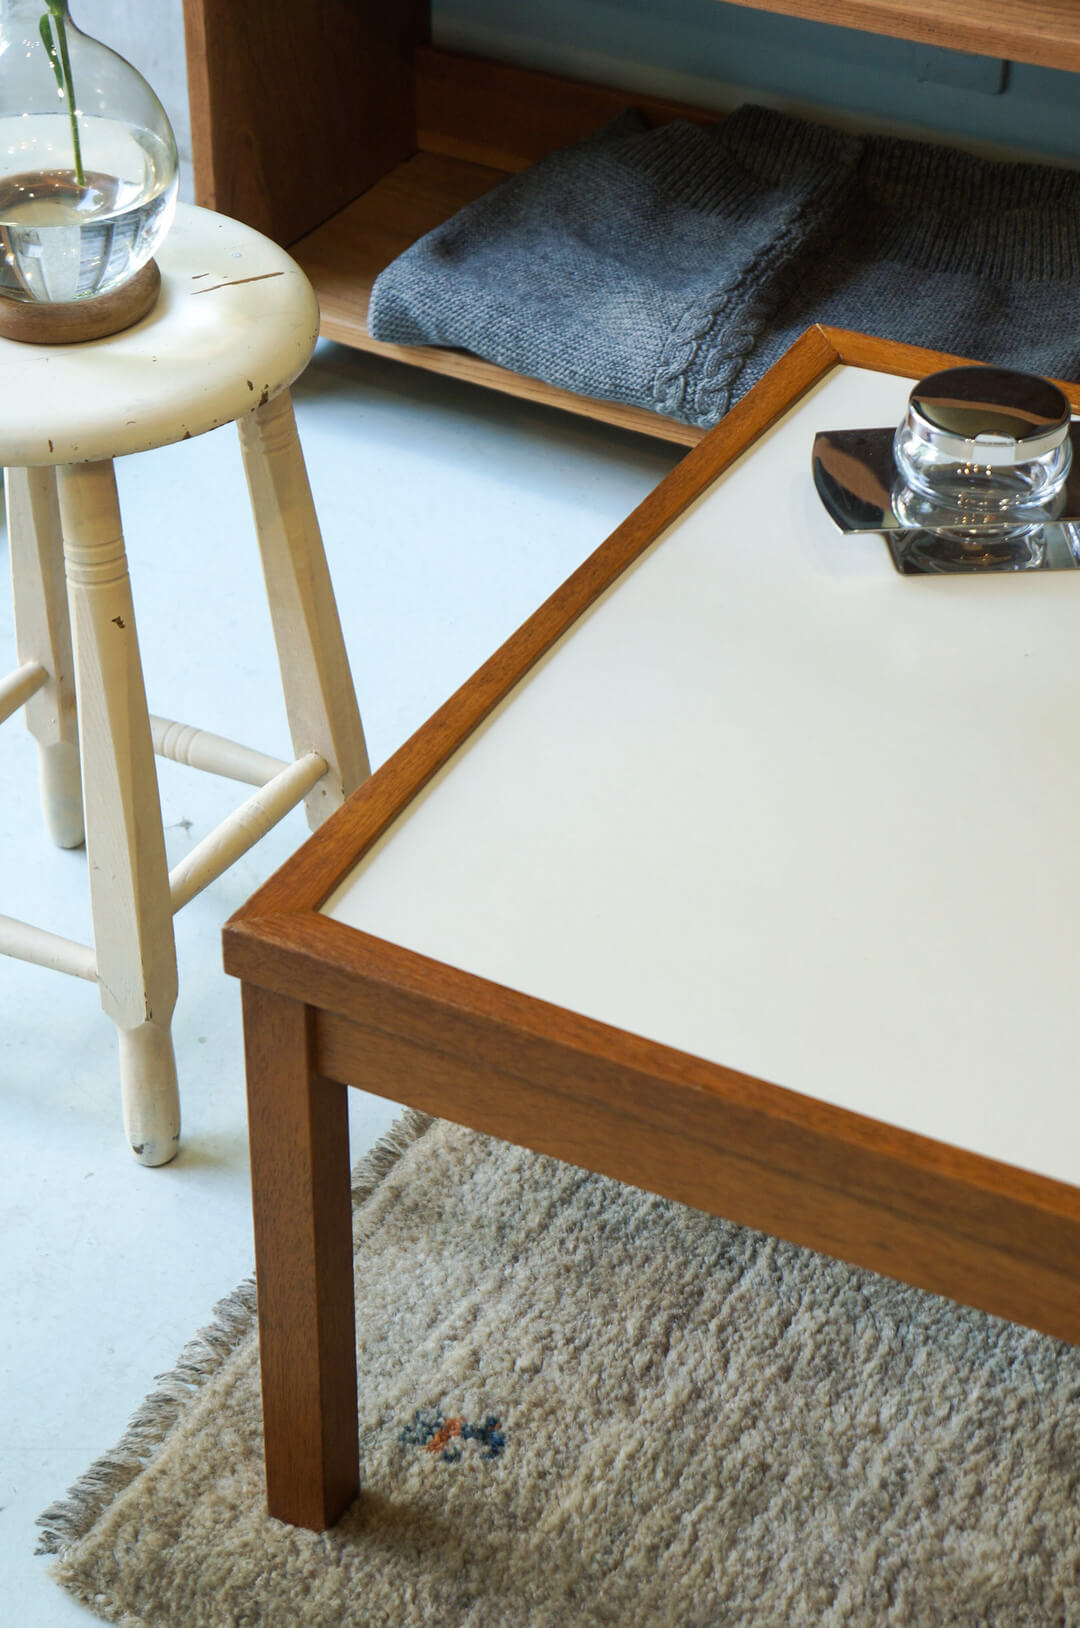 Japanese Vintage Modern Square Low Table/ジャパンヴィンテージ スクエアローテーブル 座卓 レトロモダン メラミントップ